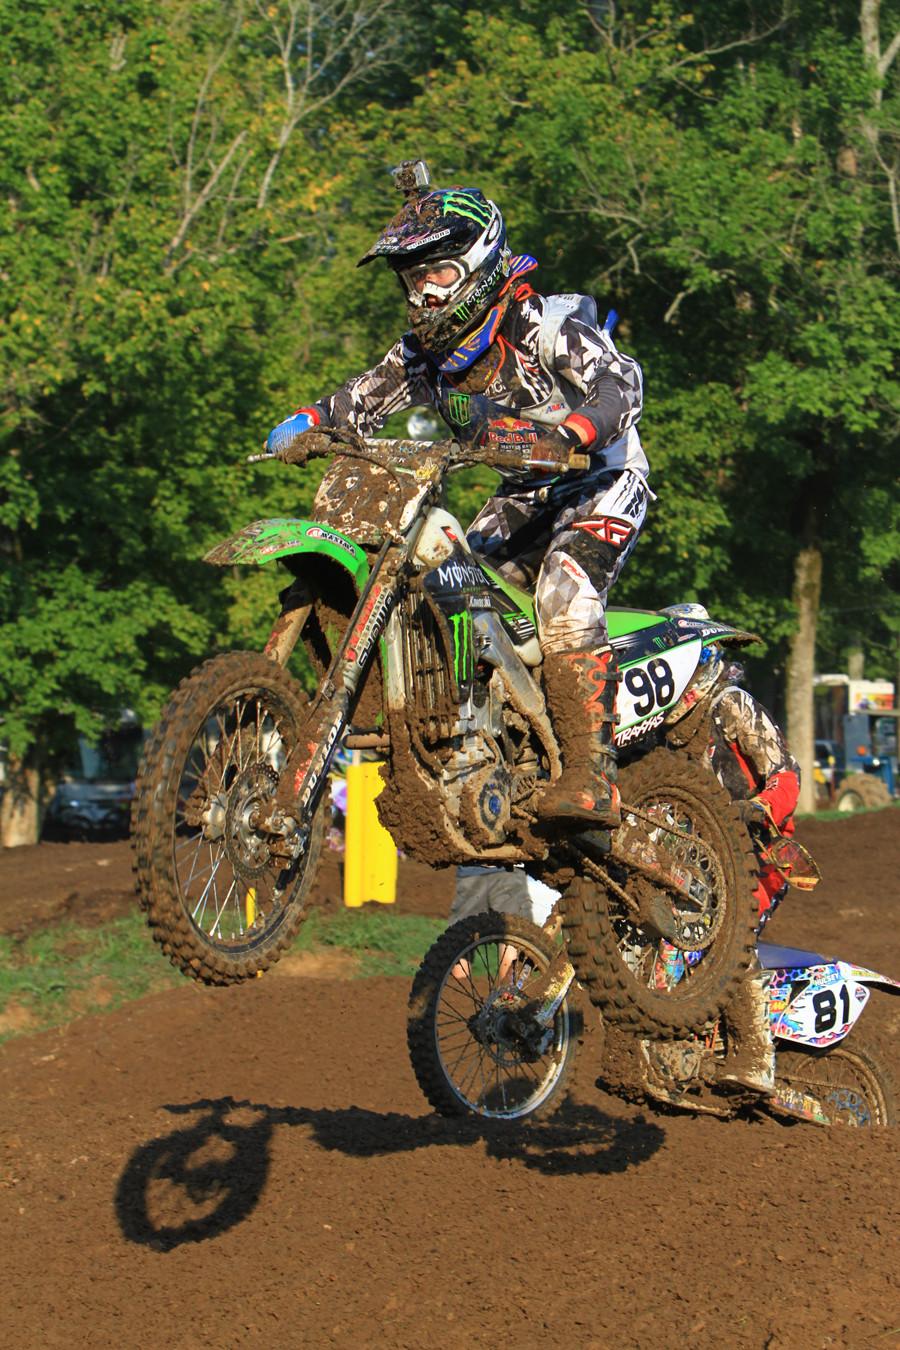 Brandy Richards - Day 2: 2012 Red Bull AMA Amateur National Motocross Championships - Motocross Pictures - Vital MX